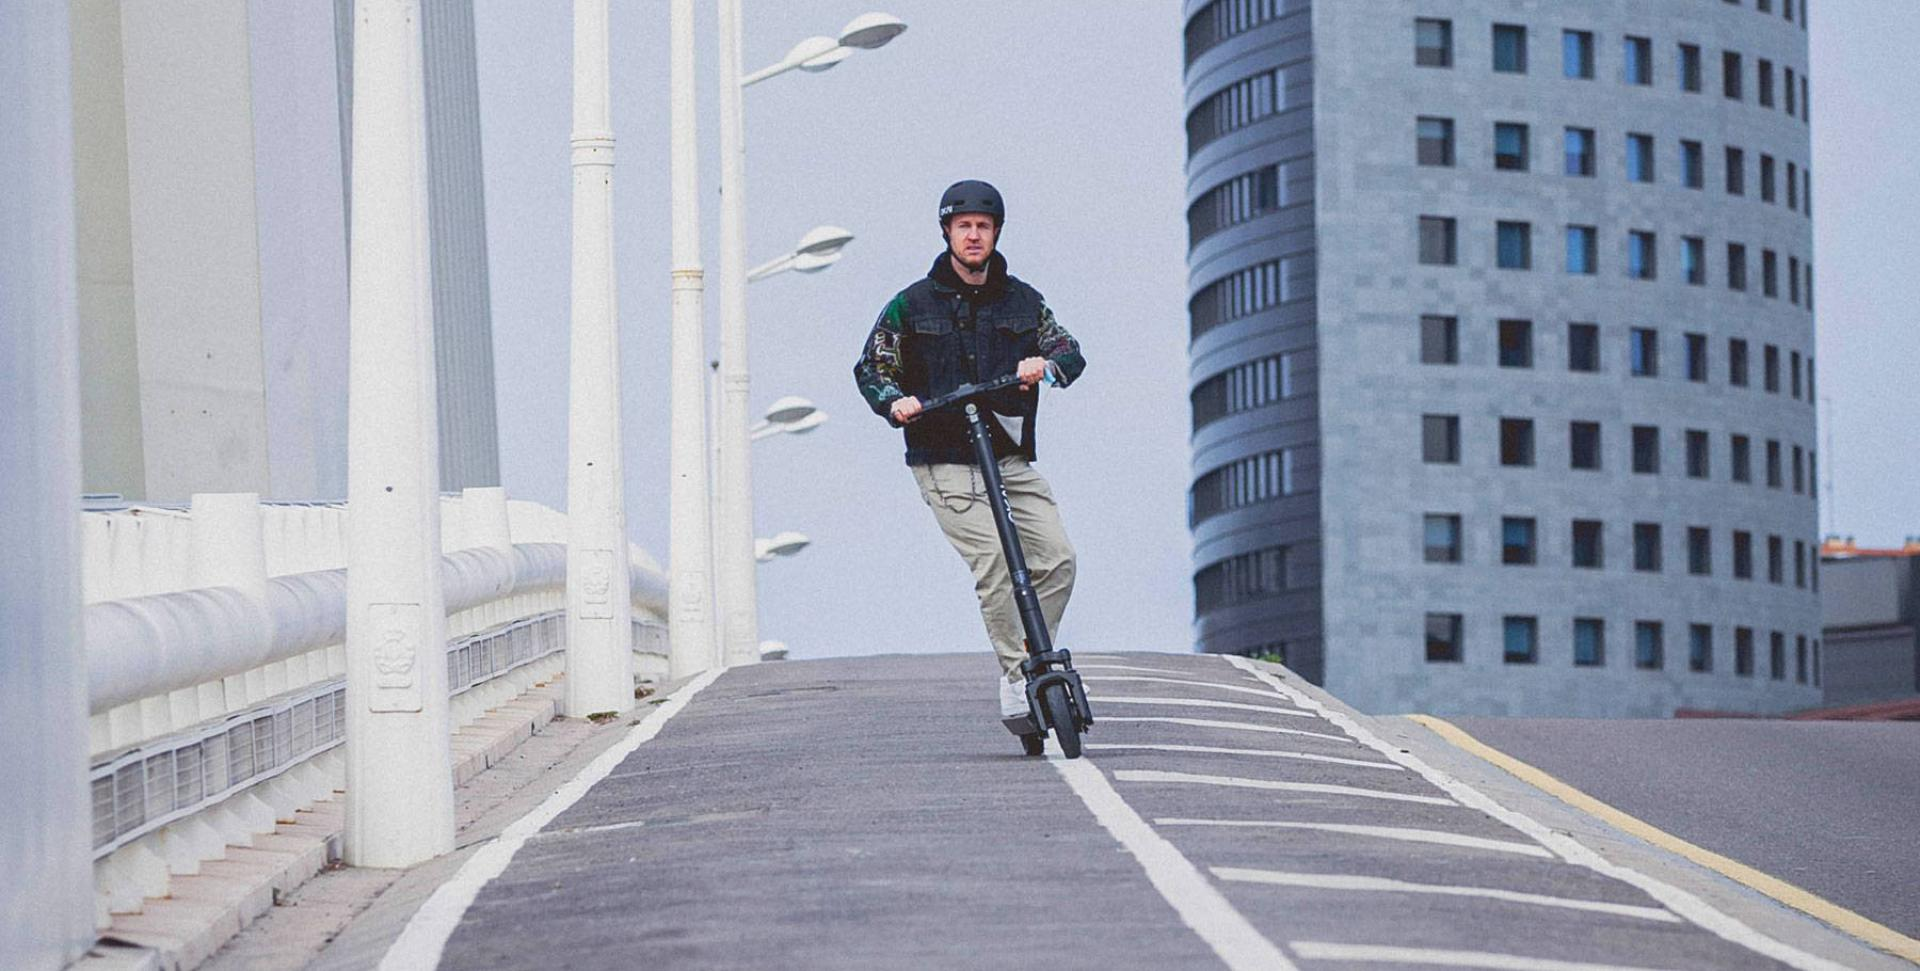 Okai-es200-escooter-man-riding-bridge-city.jpeg